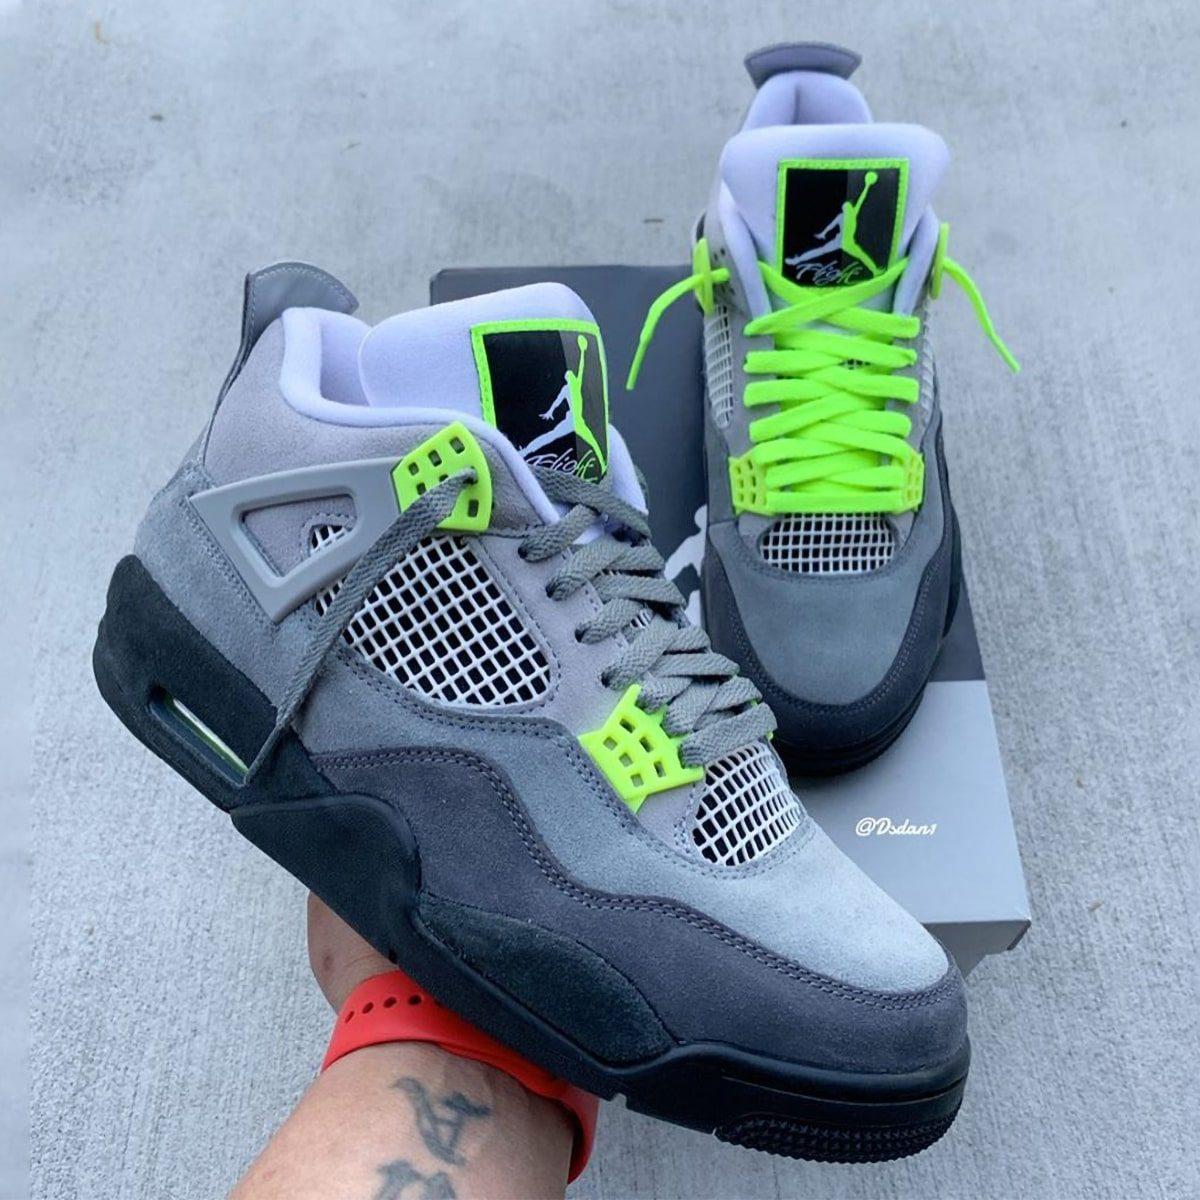 nike air max 95 neon green cool grey